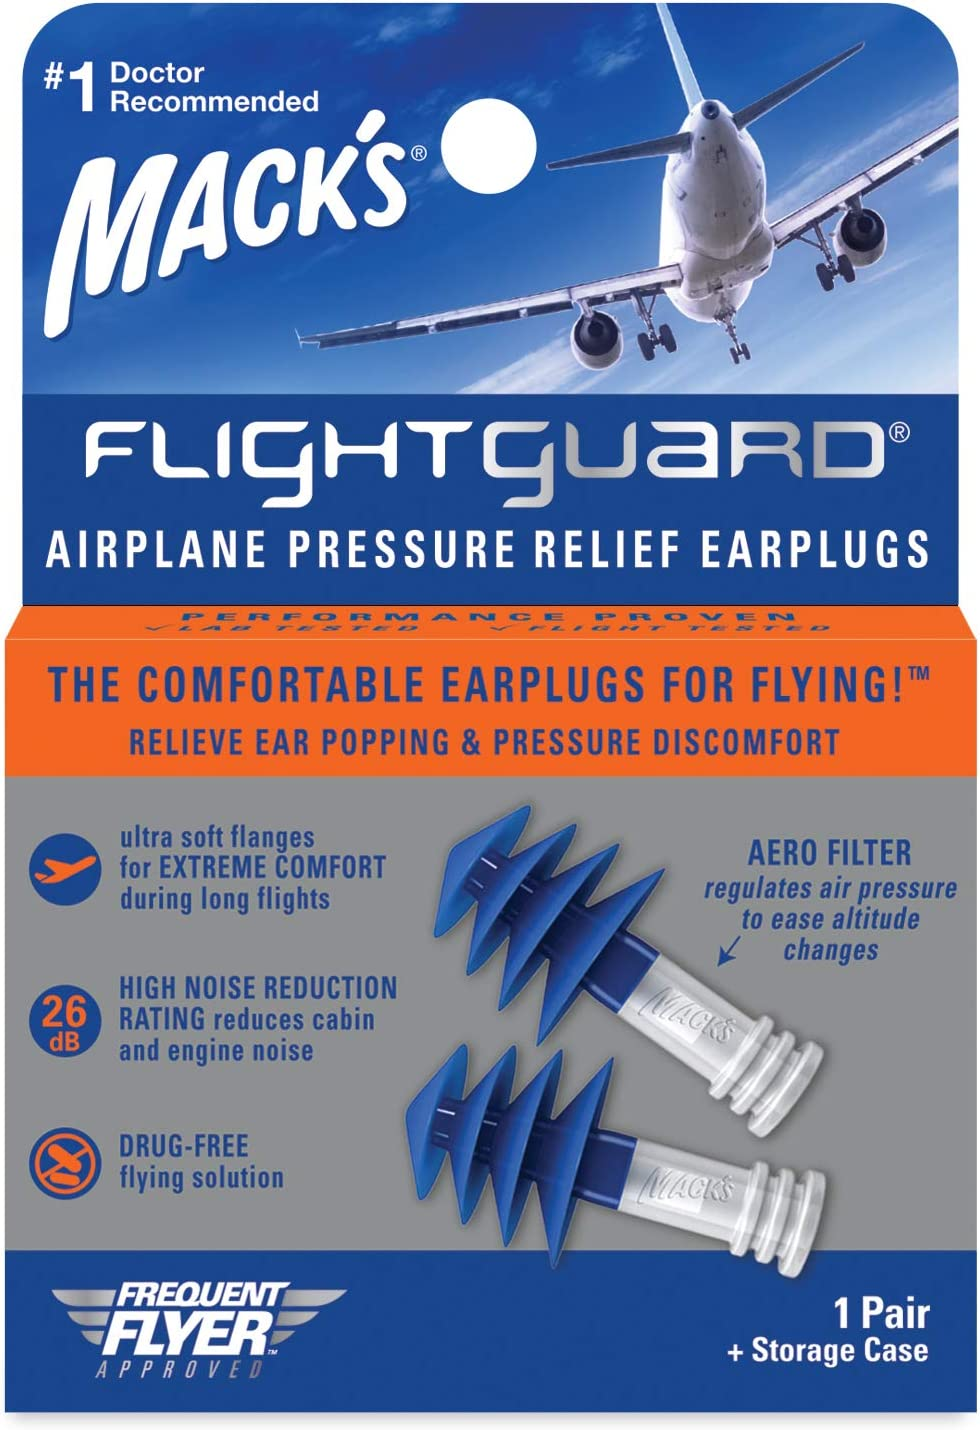 Mack的Flateguard飞机压力释放耳塞